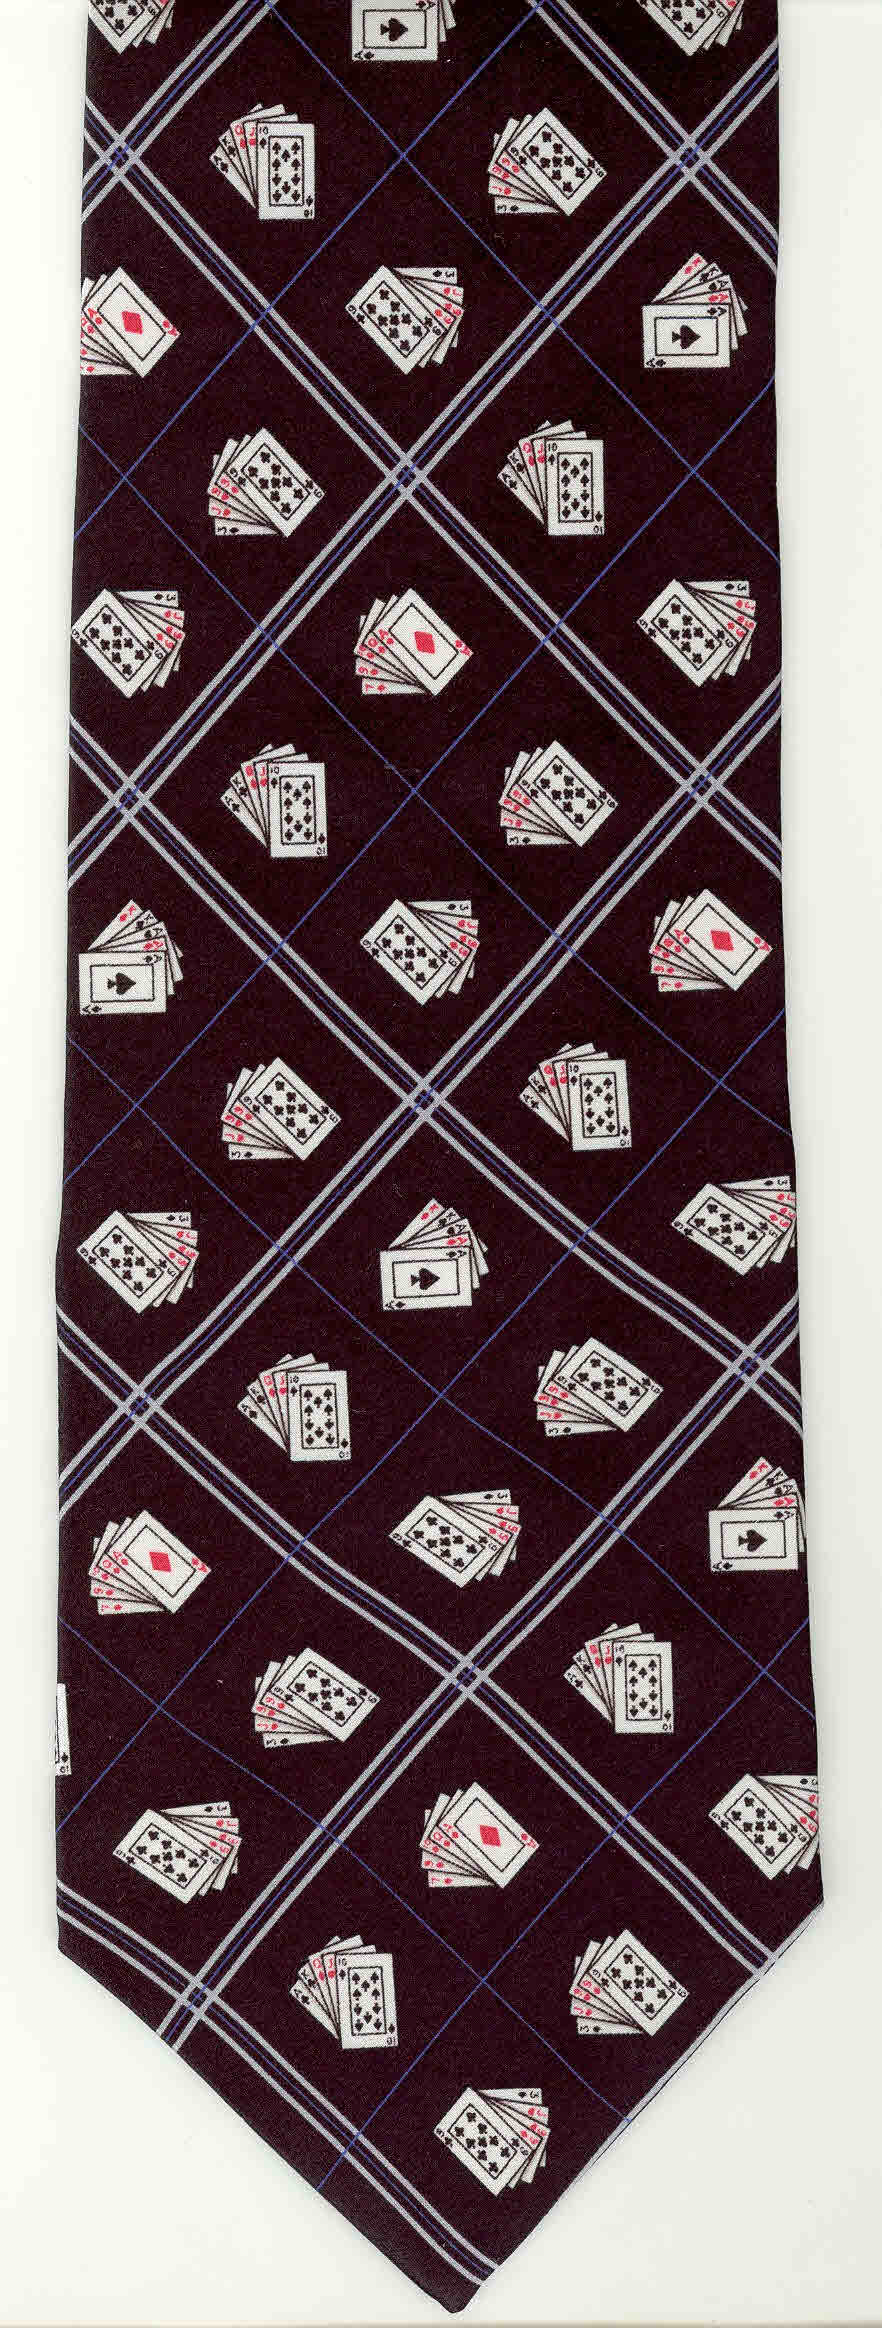 019 Poker Hands (B).jpg